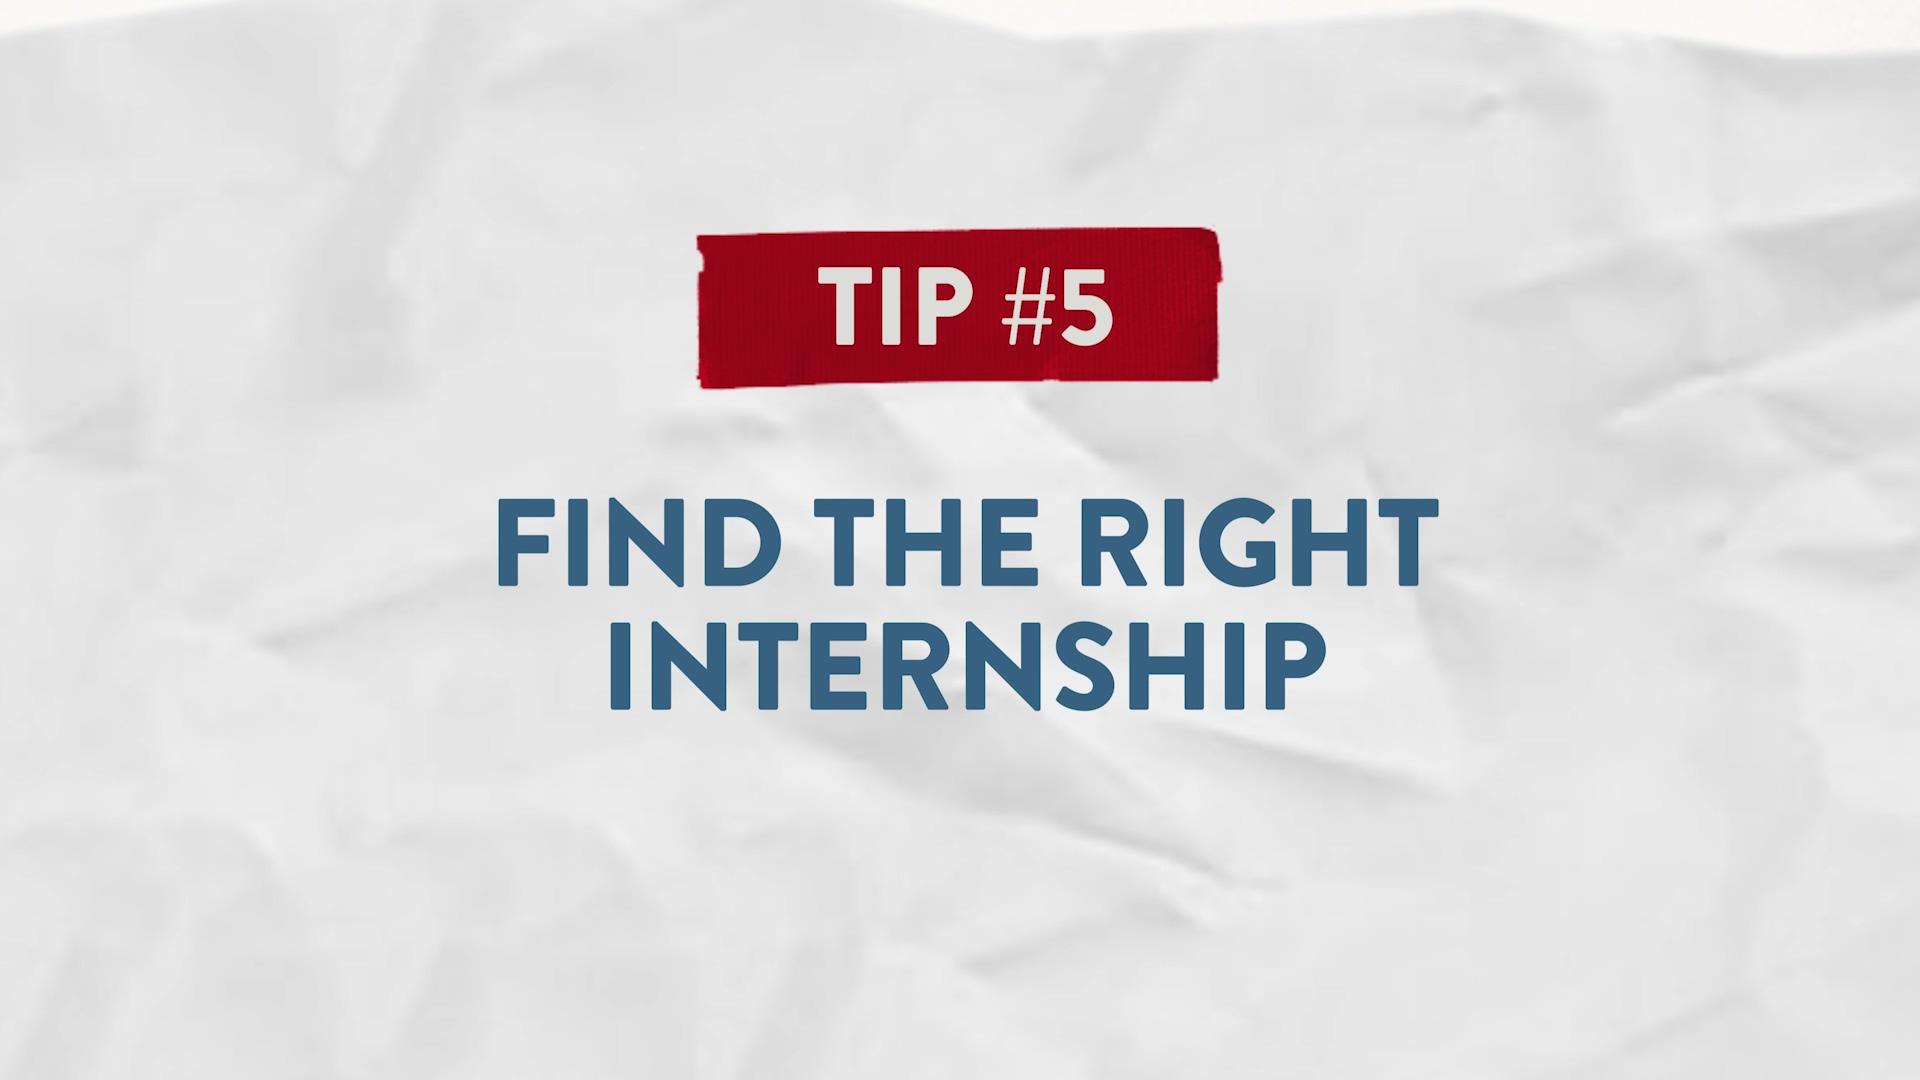 Tip #5 Find the Right Internship